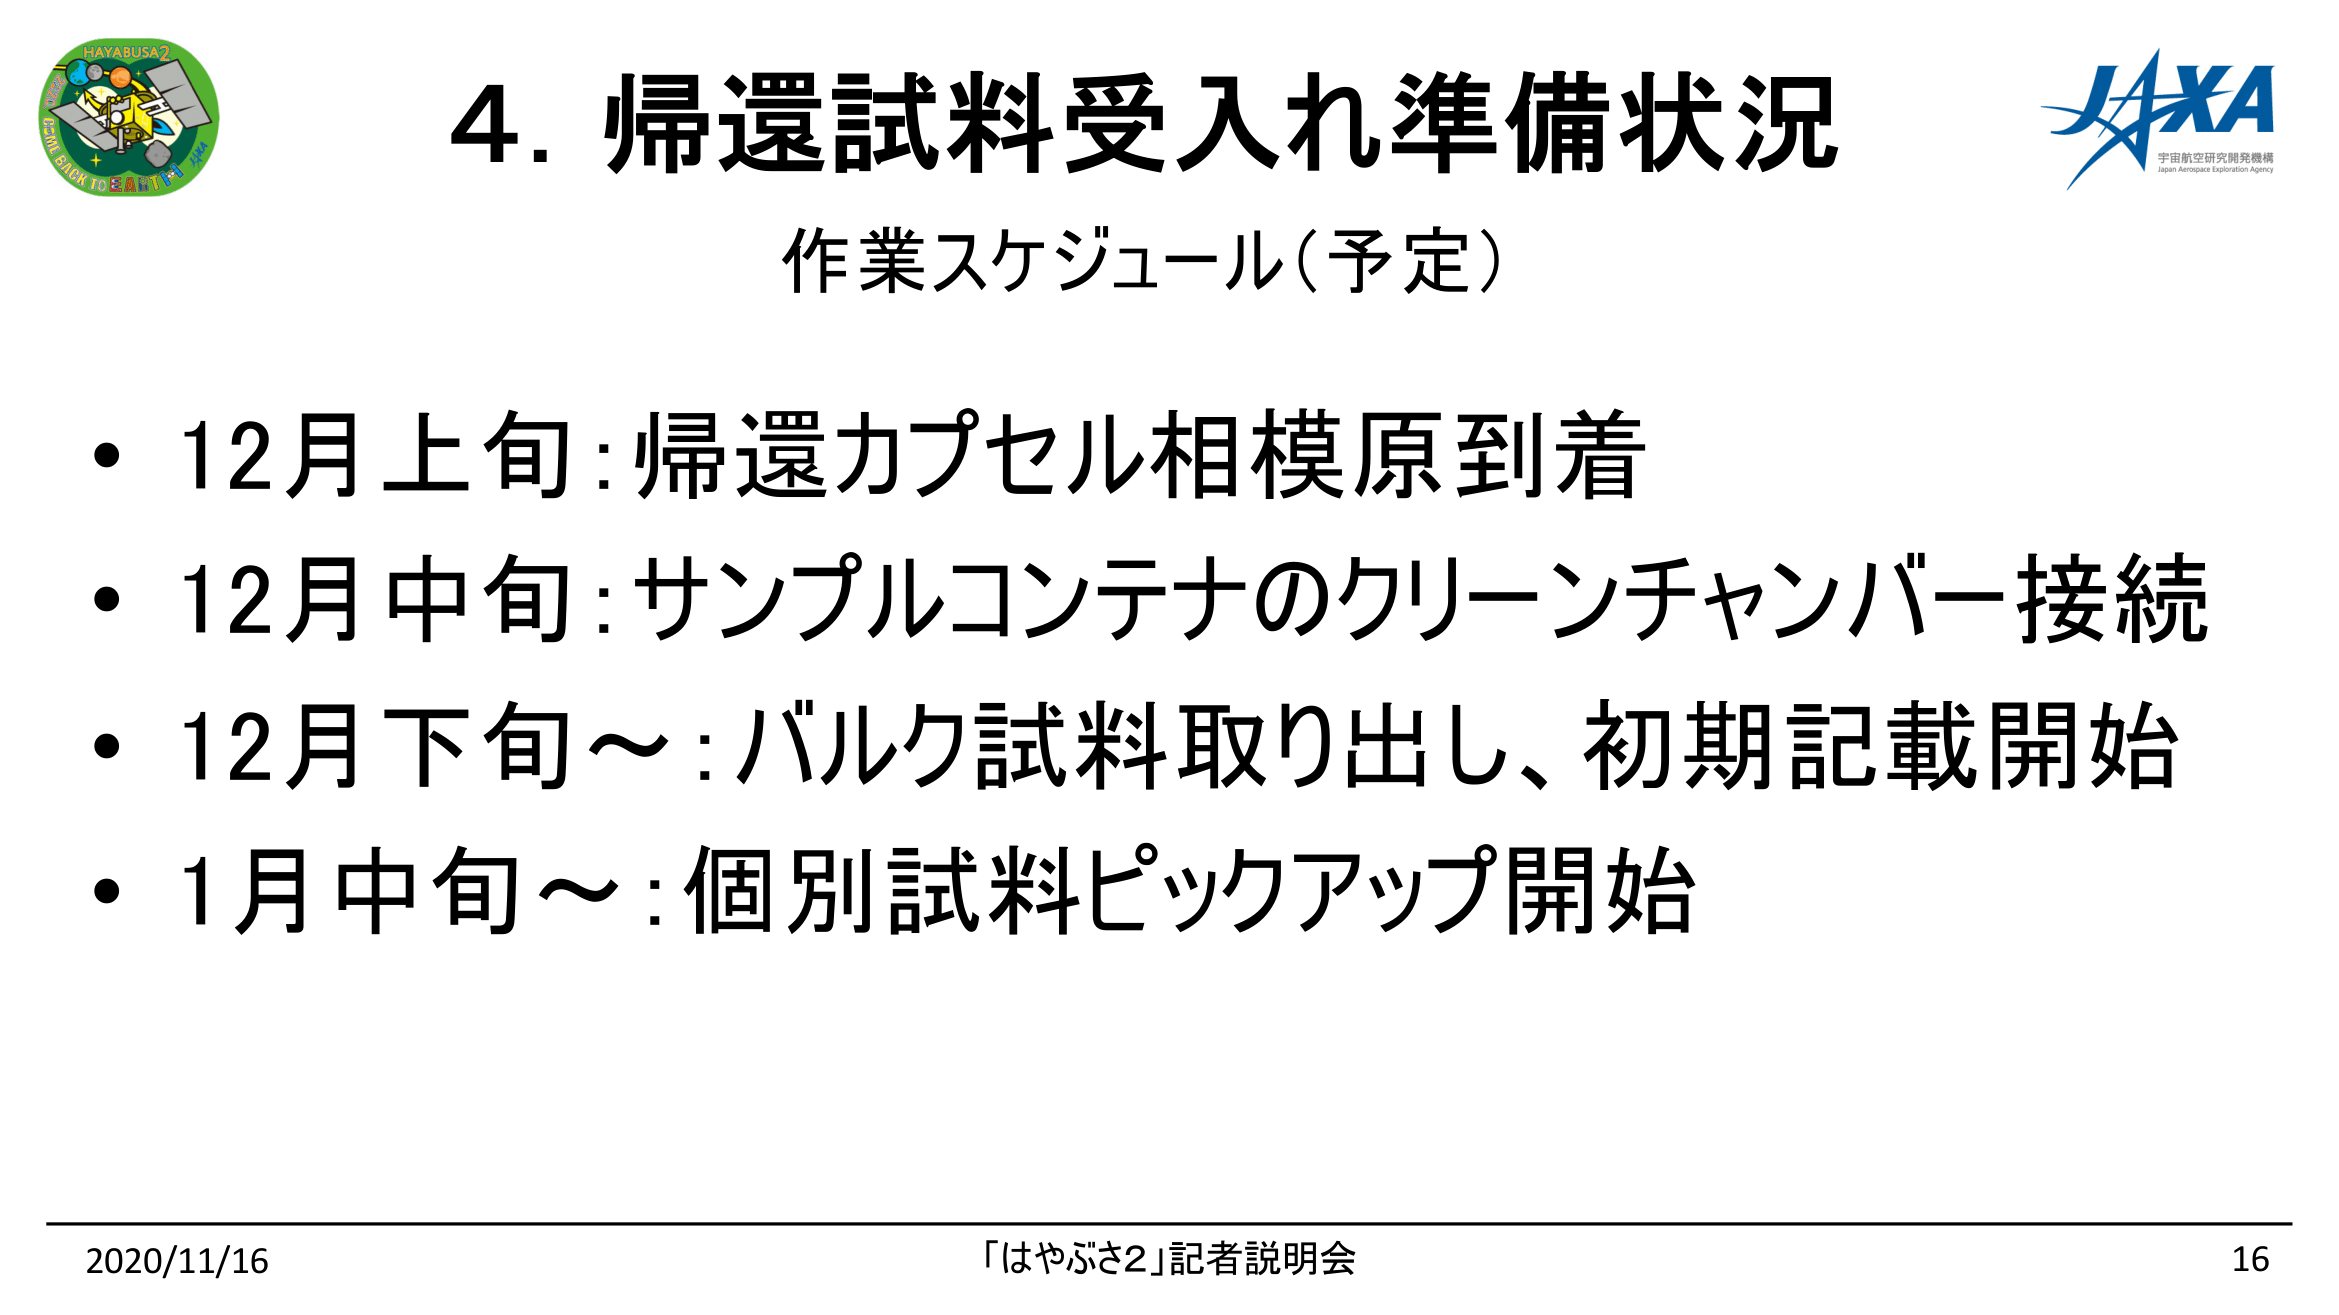 f:id:Imamura:20201116151304p:plain